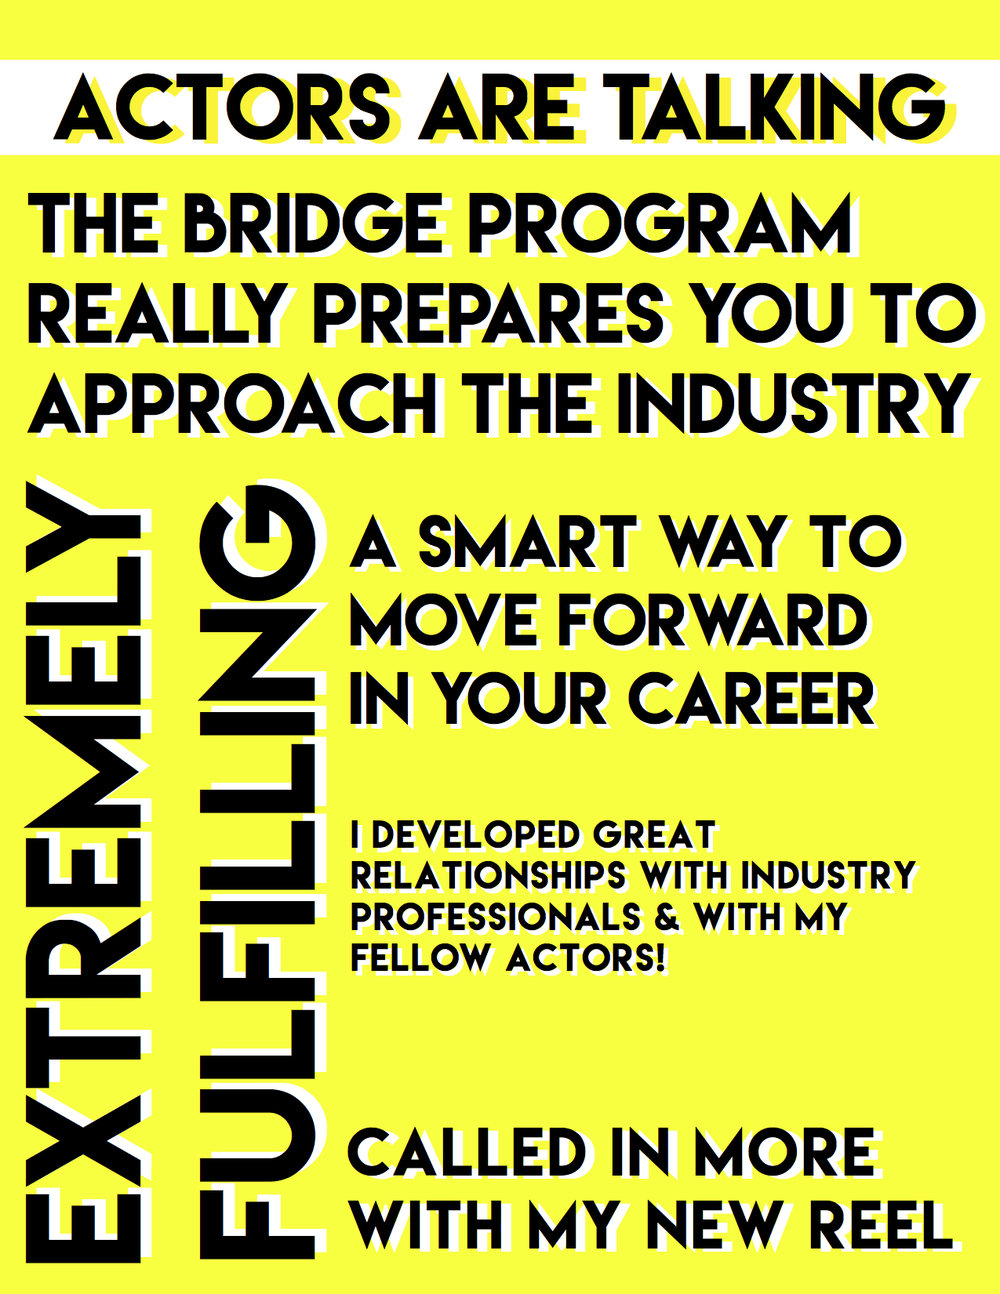 Bridge Program Brochure G1 (2) (dragged).jpg